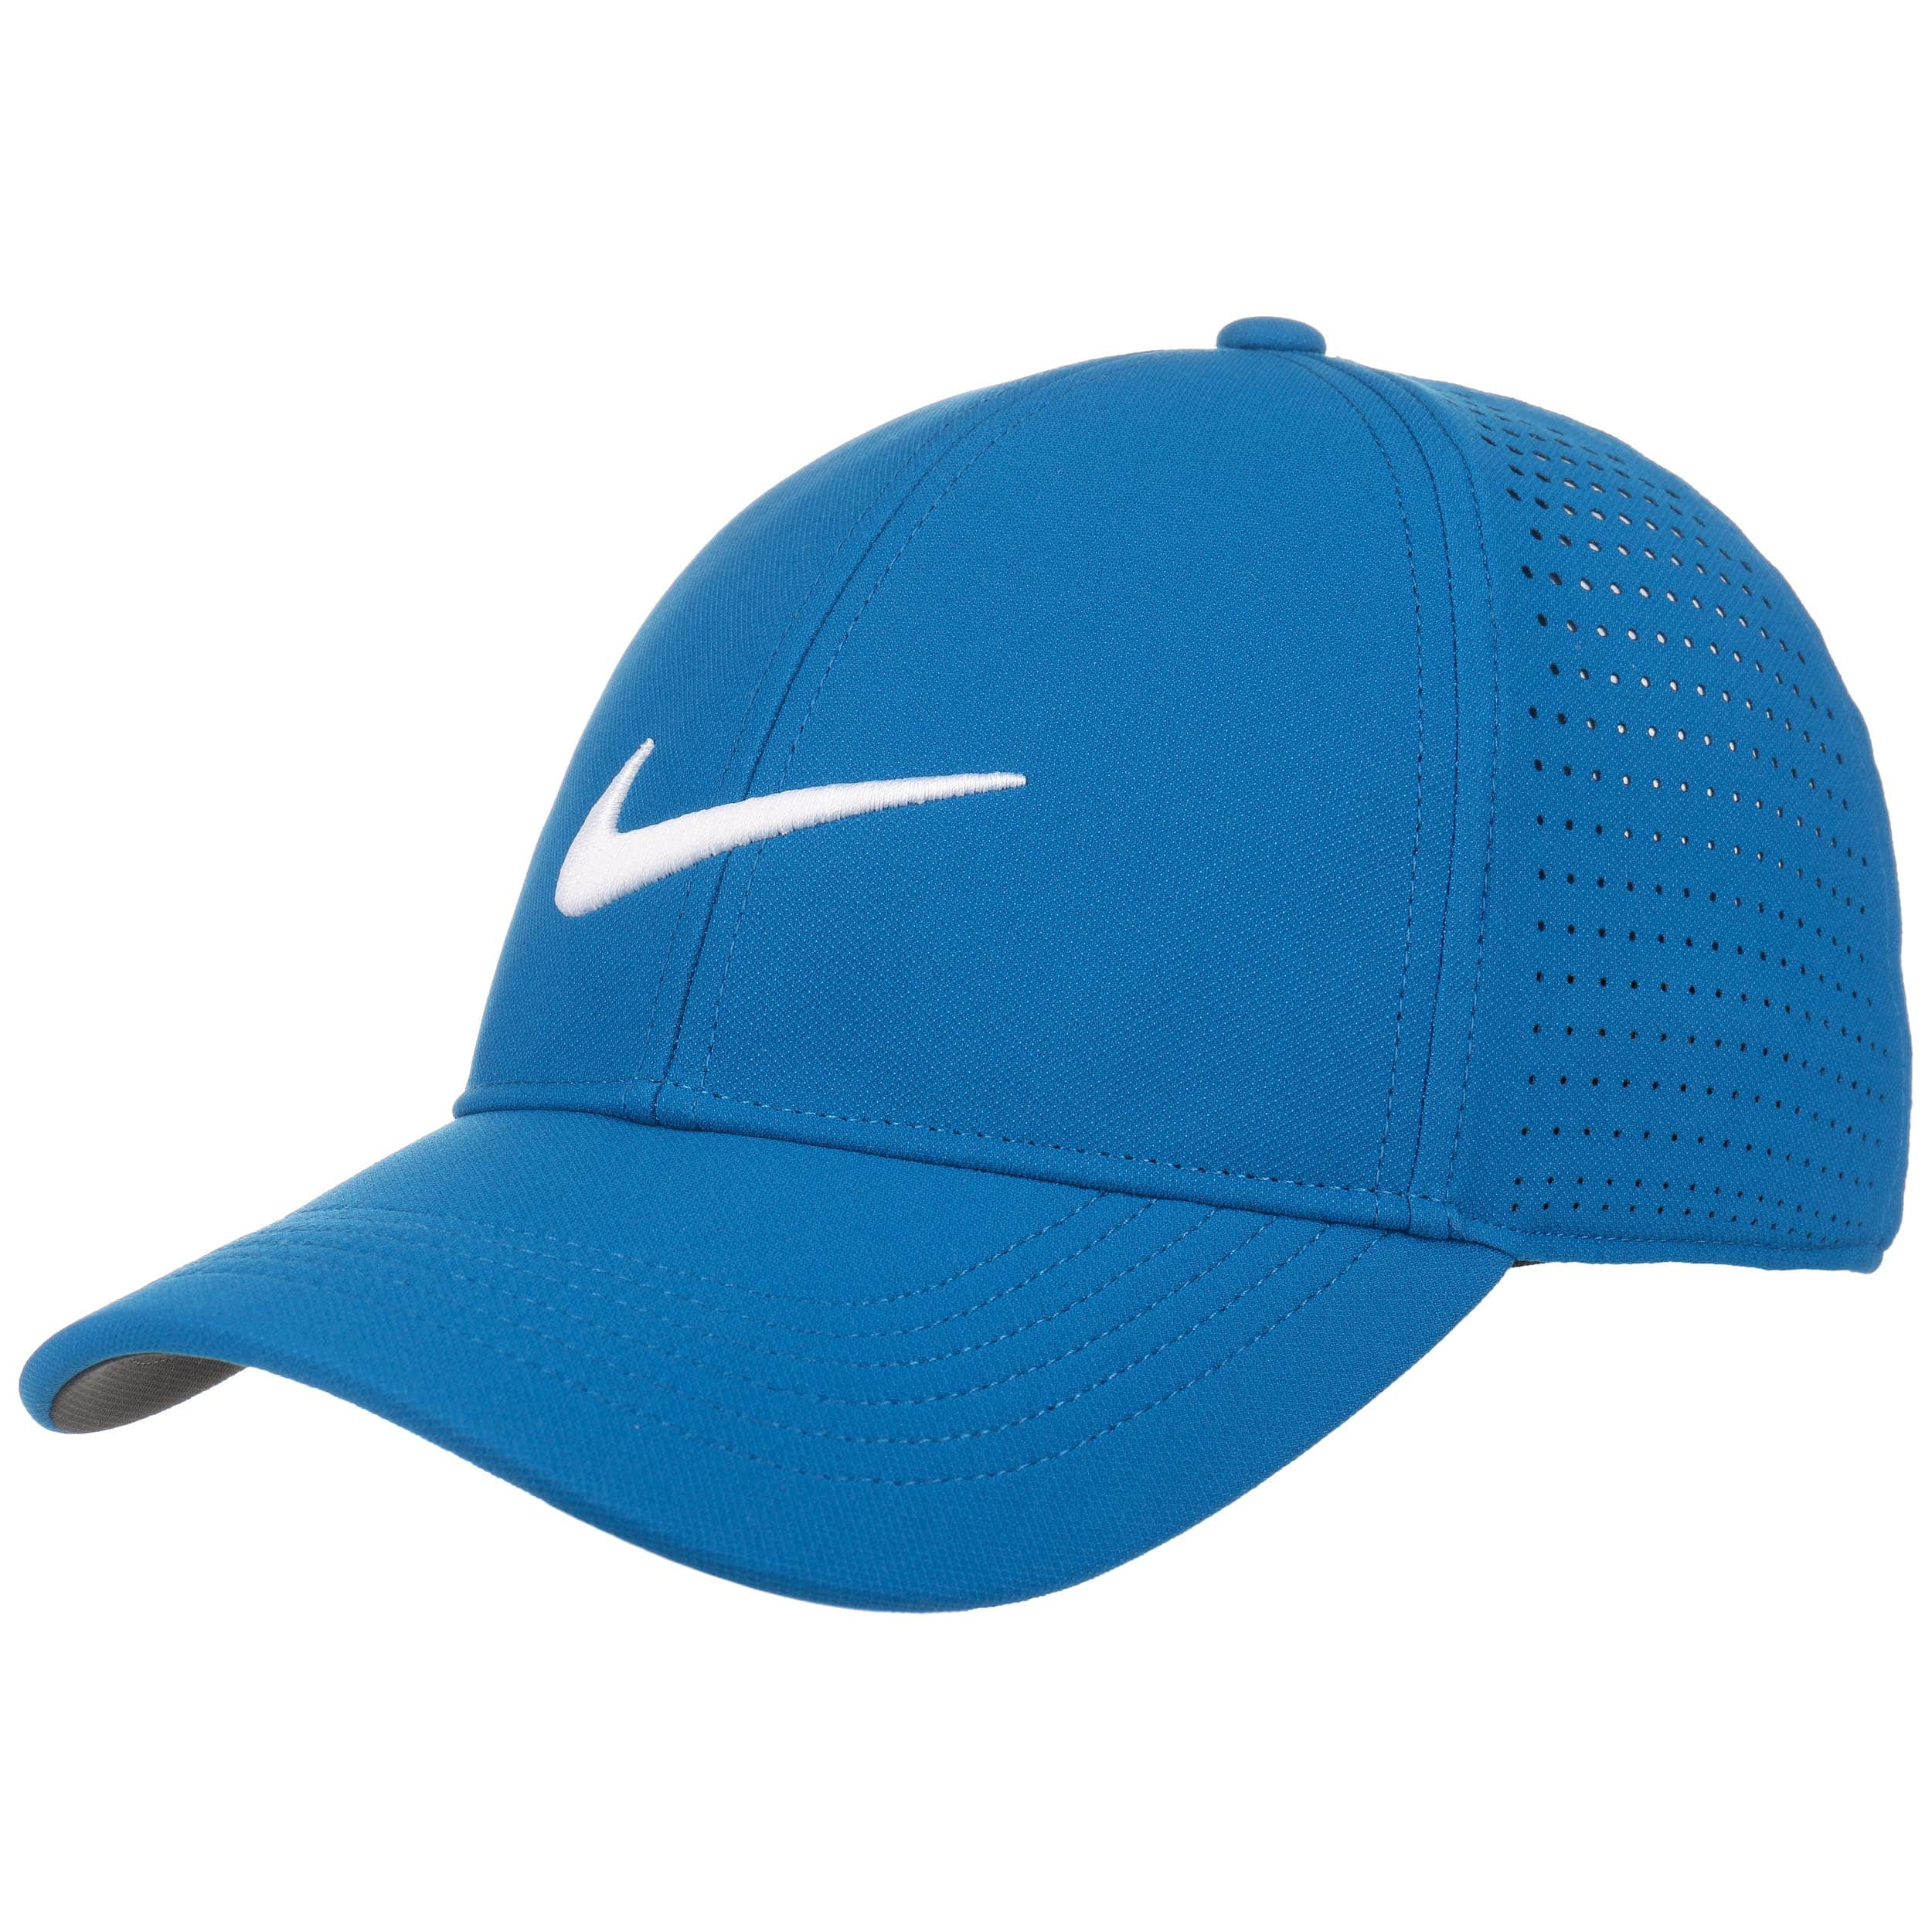 Gorra Legacy 91 Perf Strapback by Nike - Gorras - sombreroshop.es 6becc736bcd